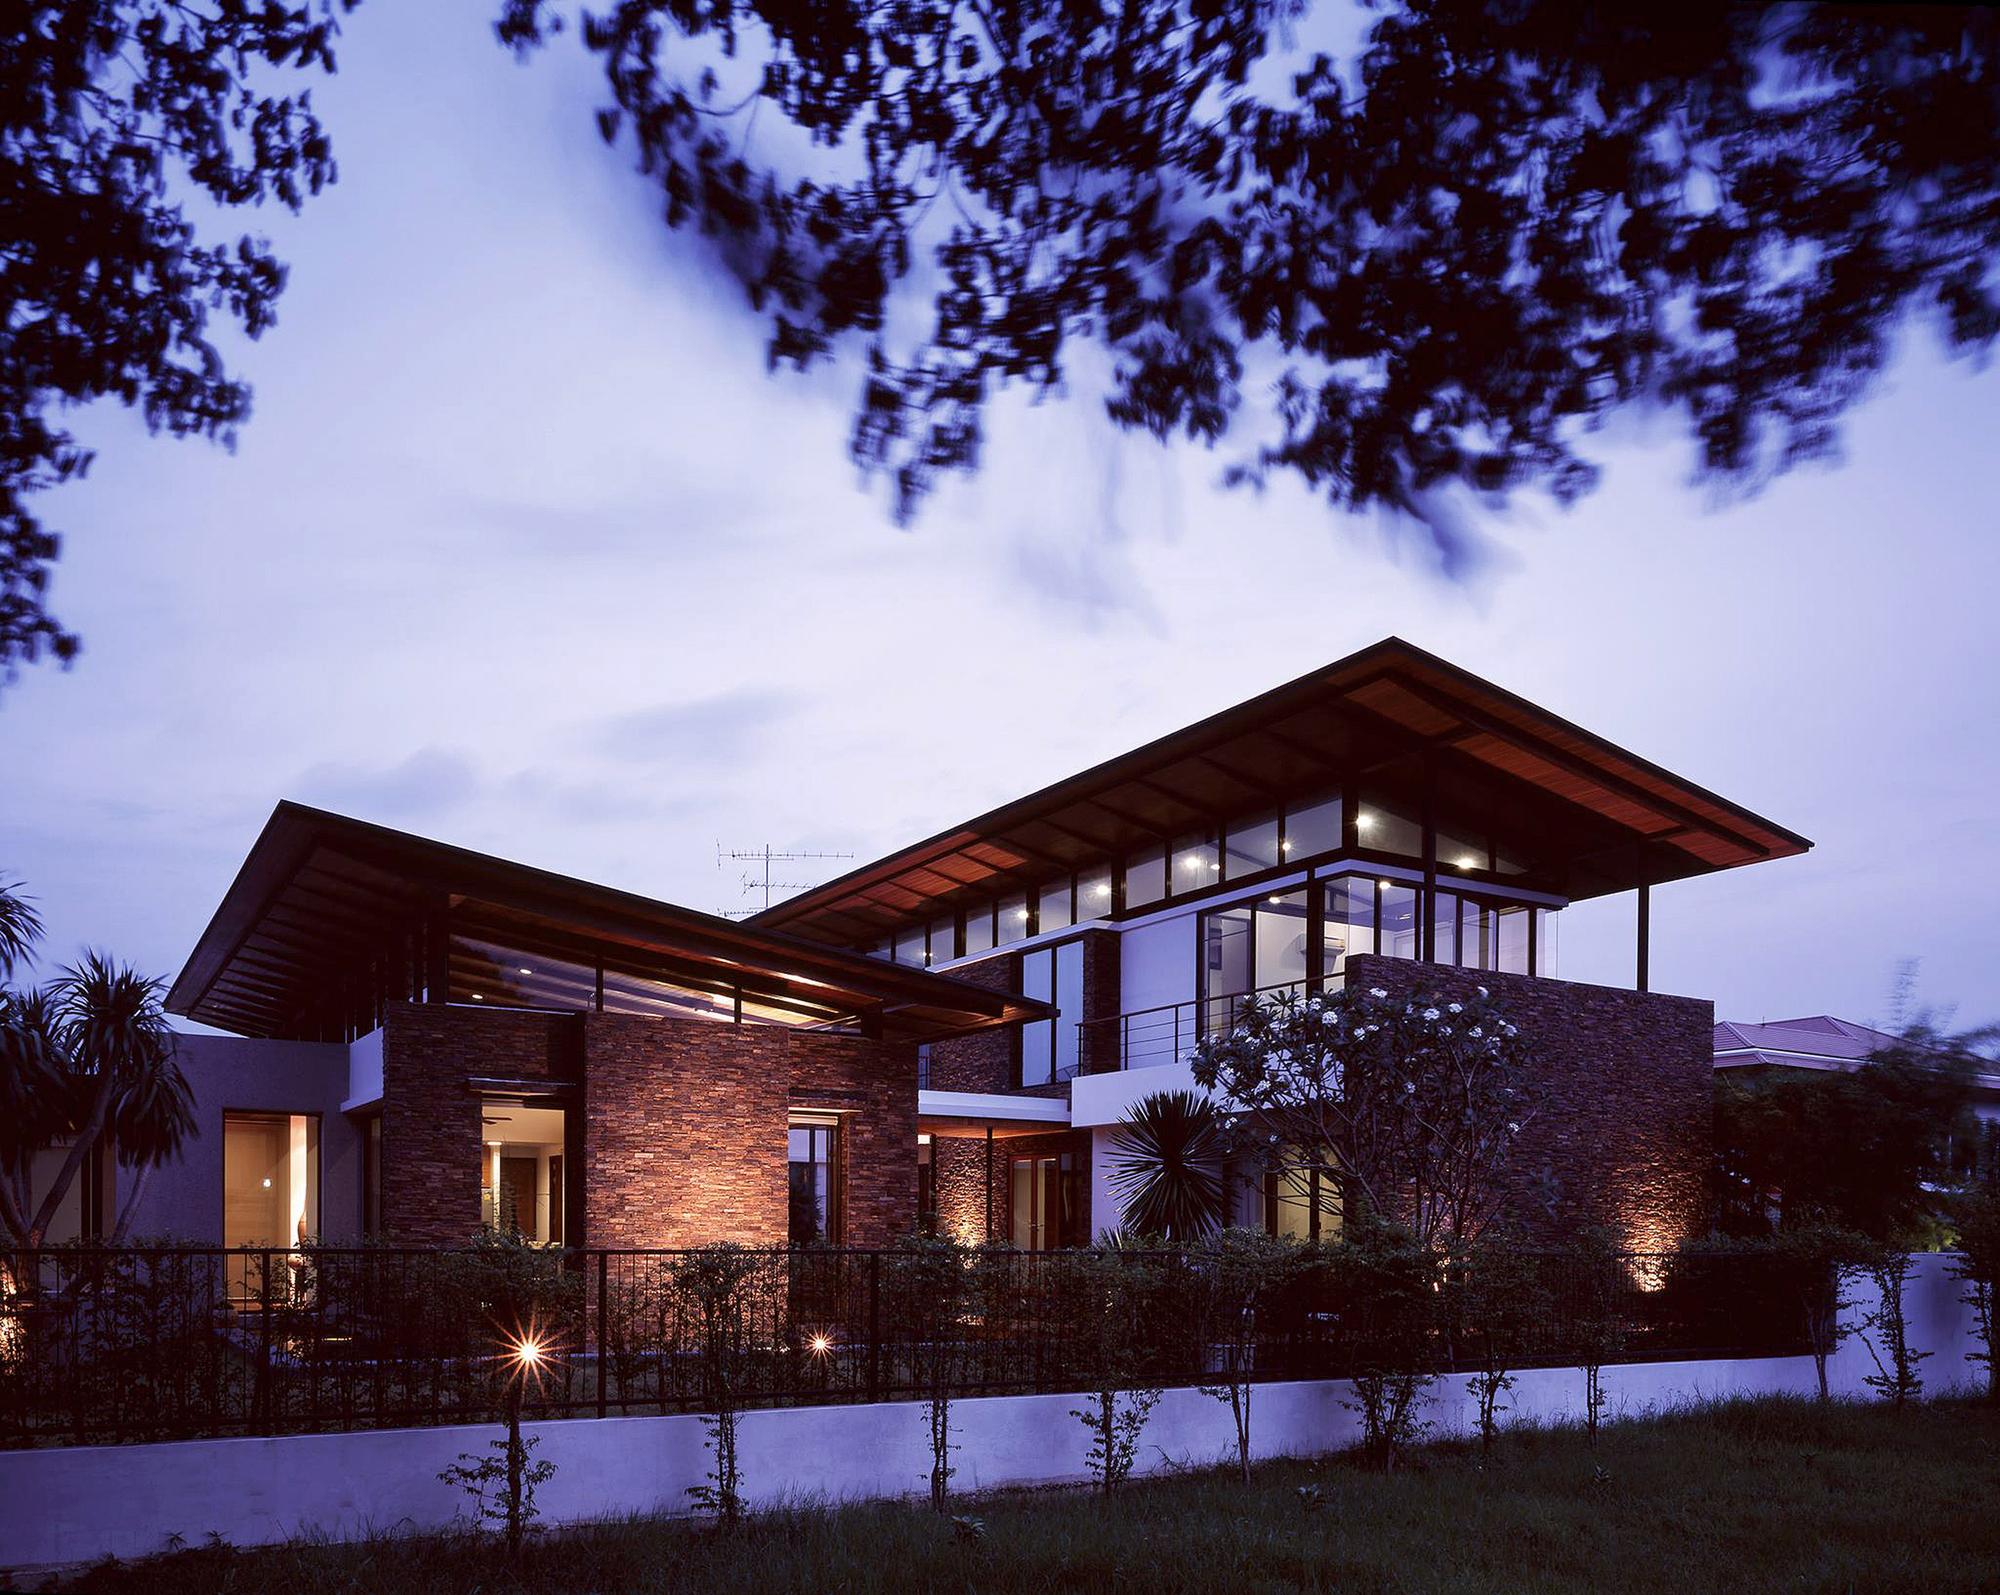 Nature House Junsekino Architect And Design - 16